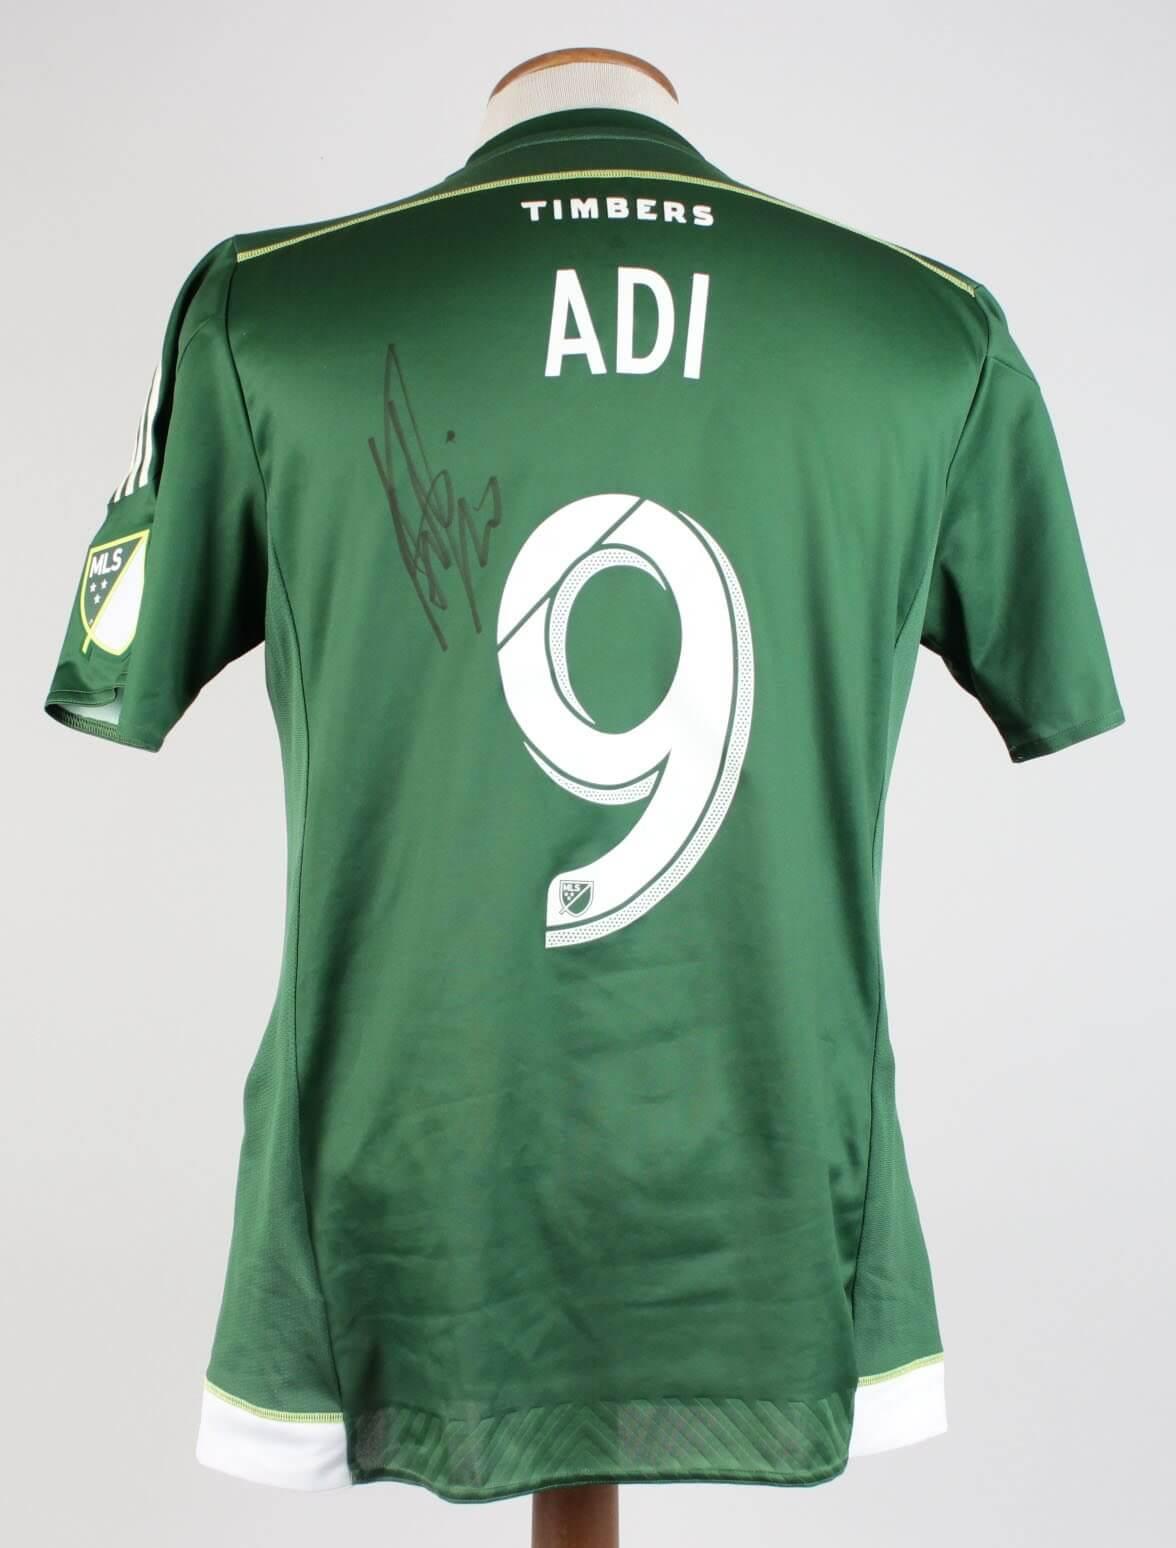 2015 Portland Timbers Fanendo Adi Match Worn, Signed Jersey Vs. Columbus Crew on Sept. 1653132_01